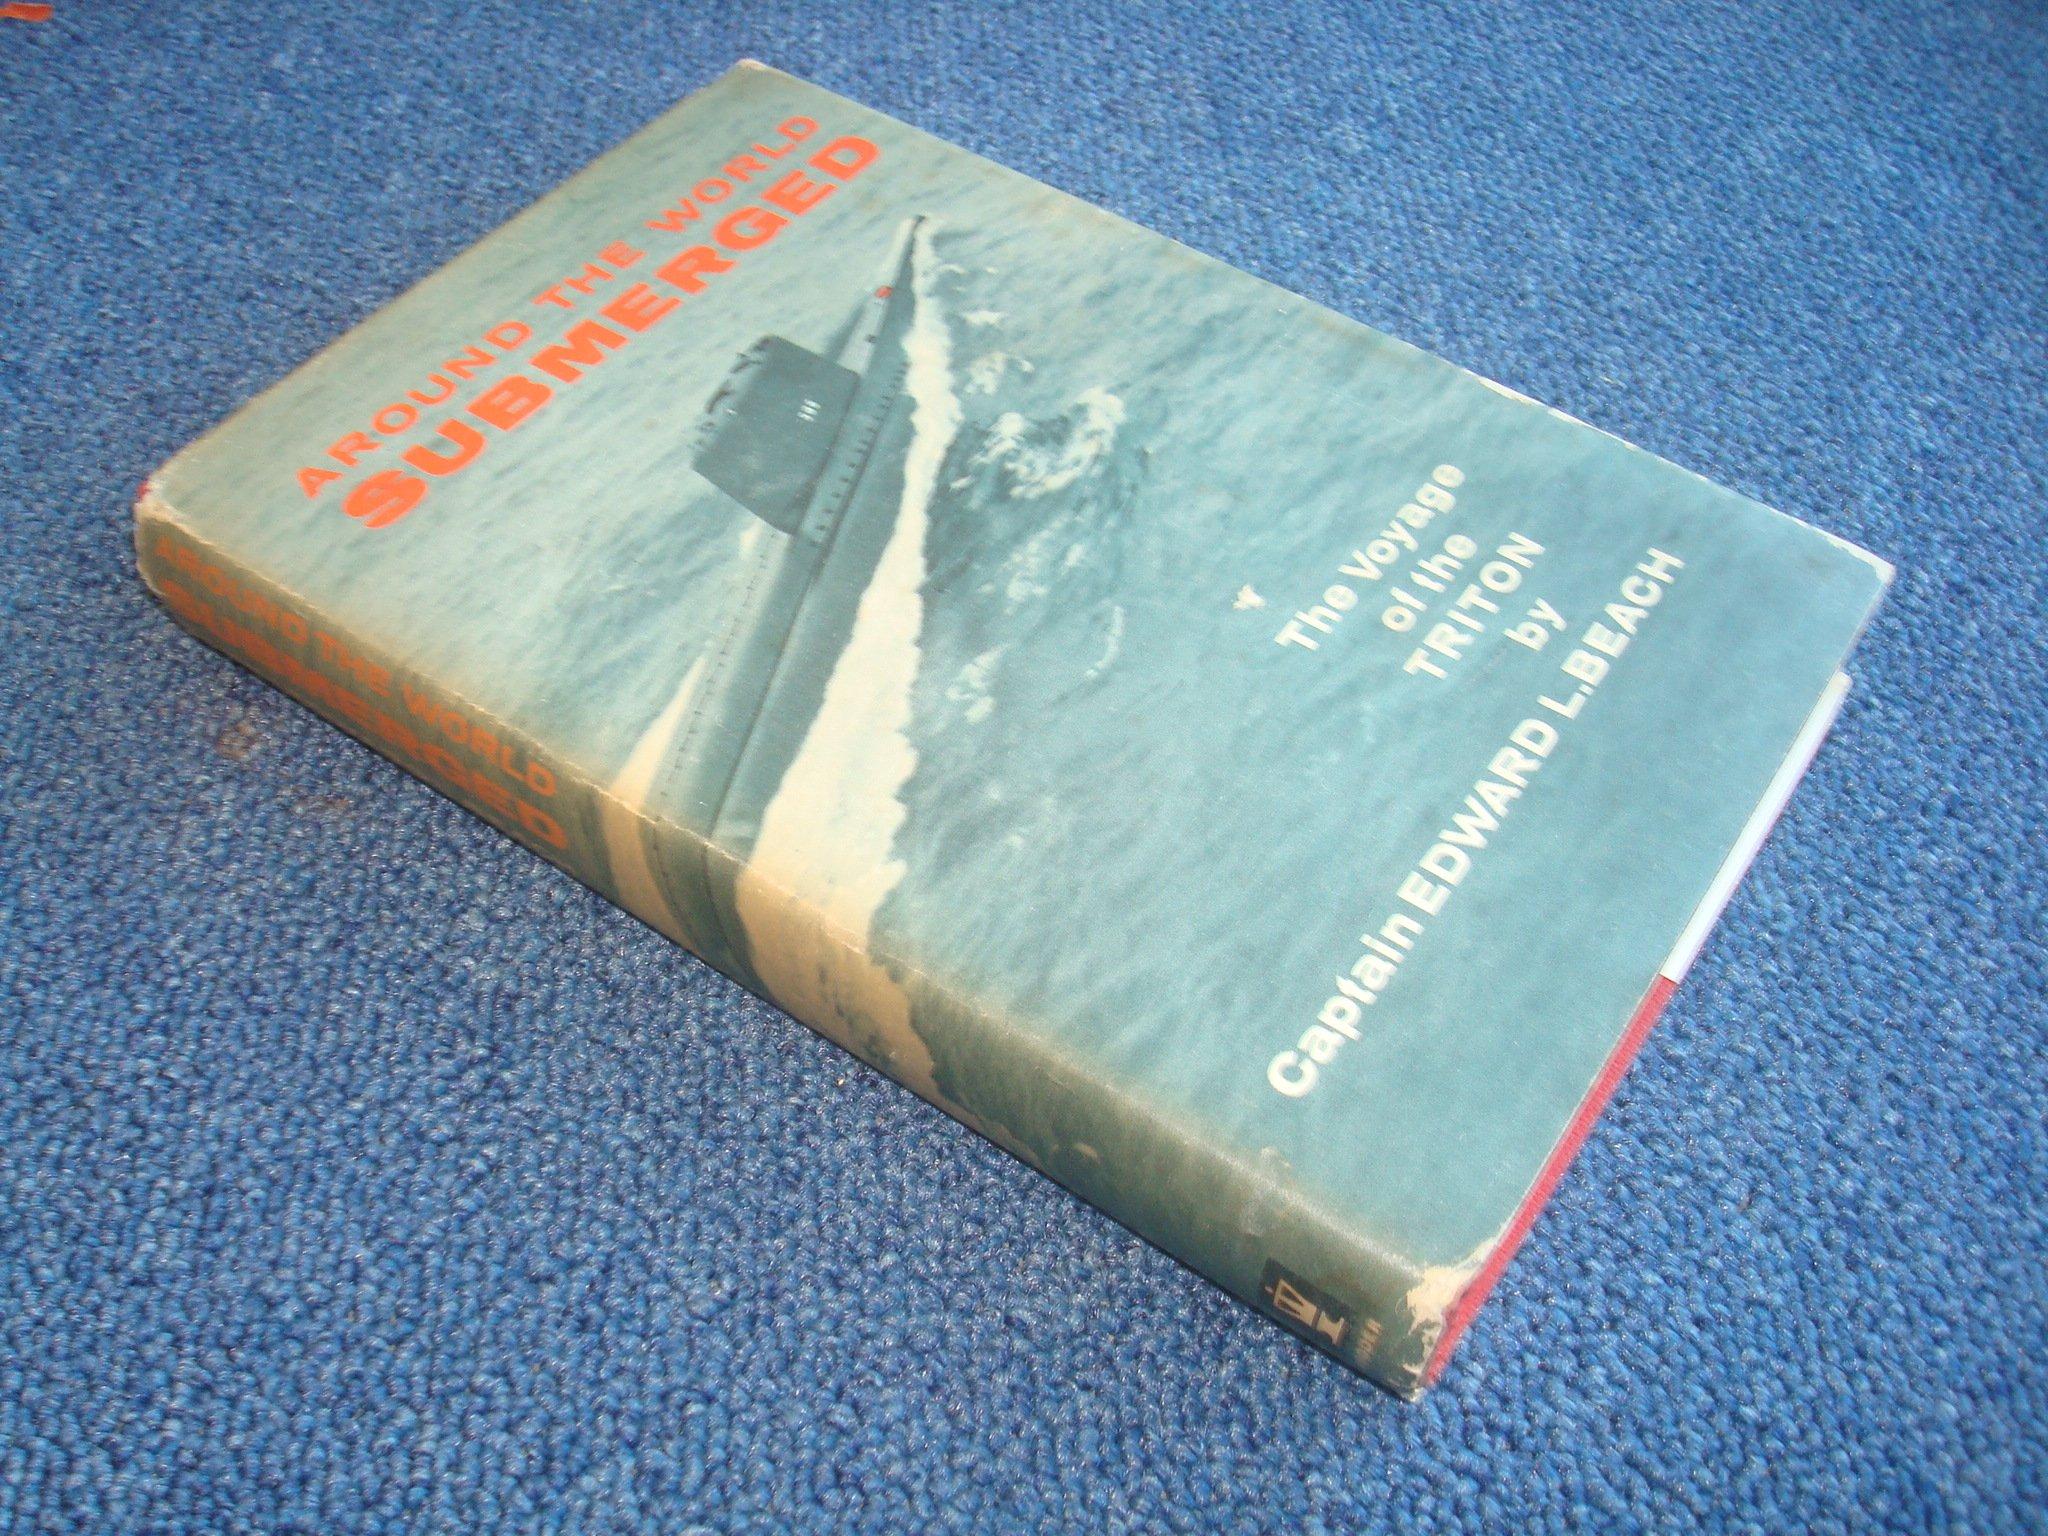 Around the World Submerged: the Voyage of the Triton